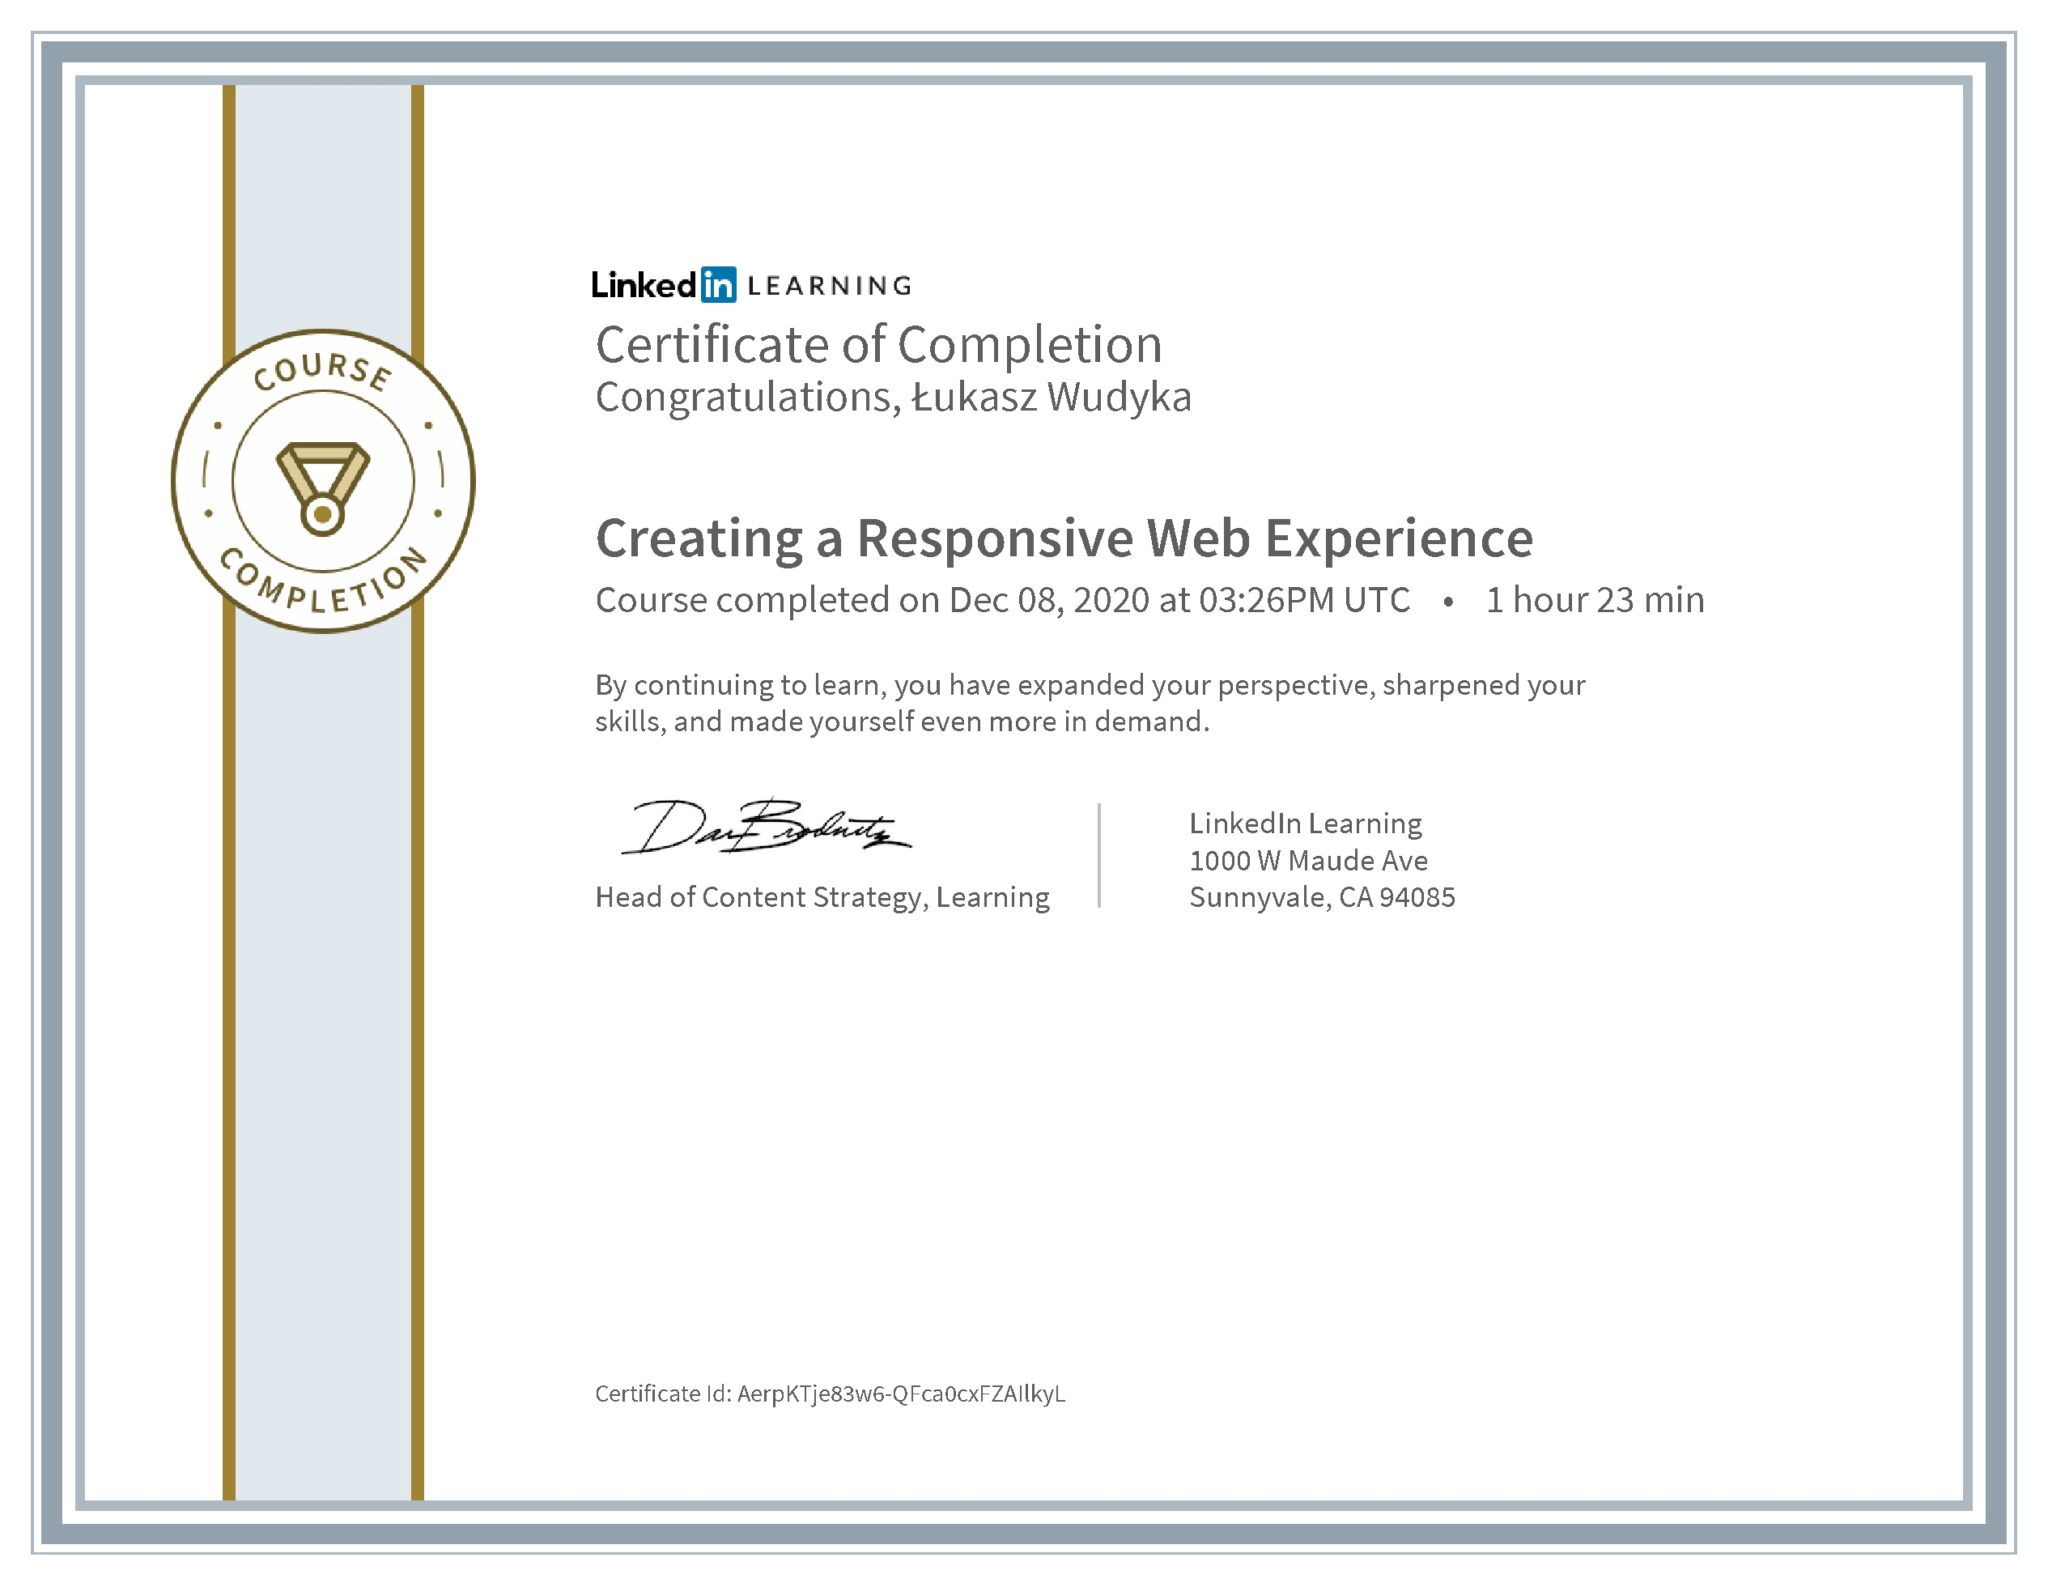 Łukasz Wudyka certyfikat LinkedIn Creating a Responsive Web Experience